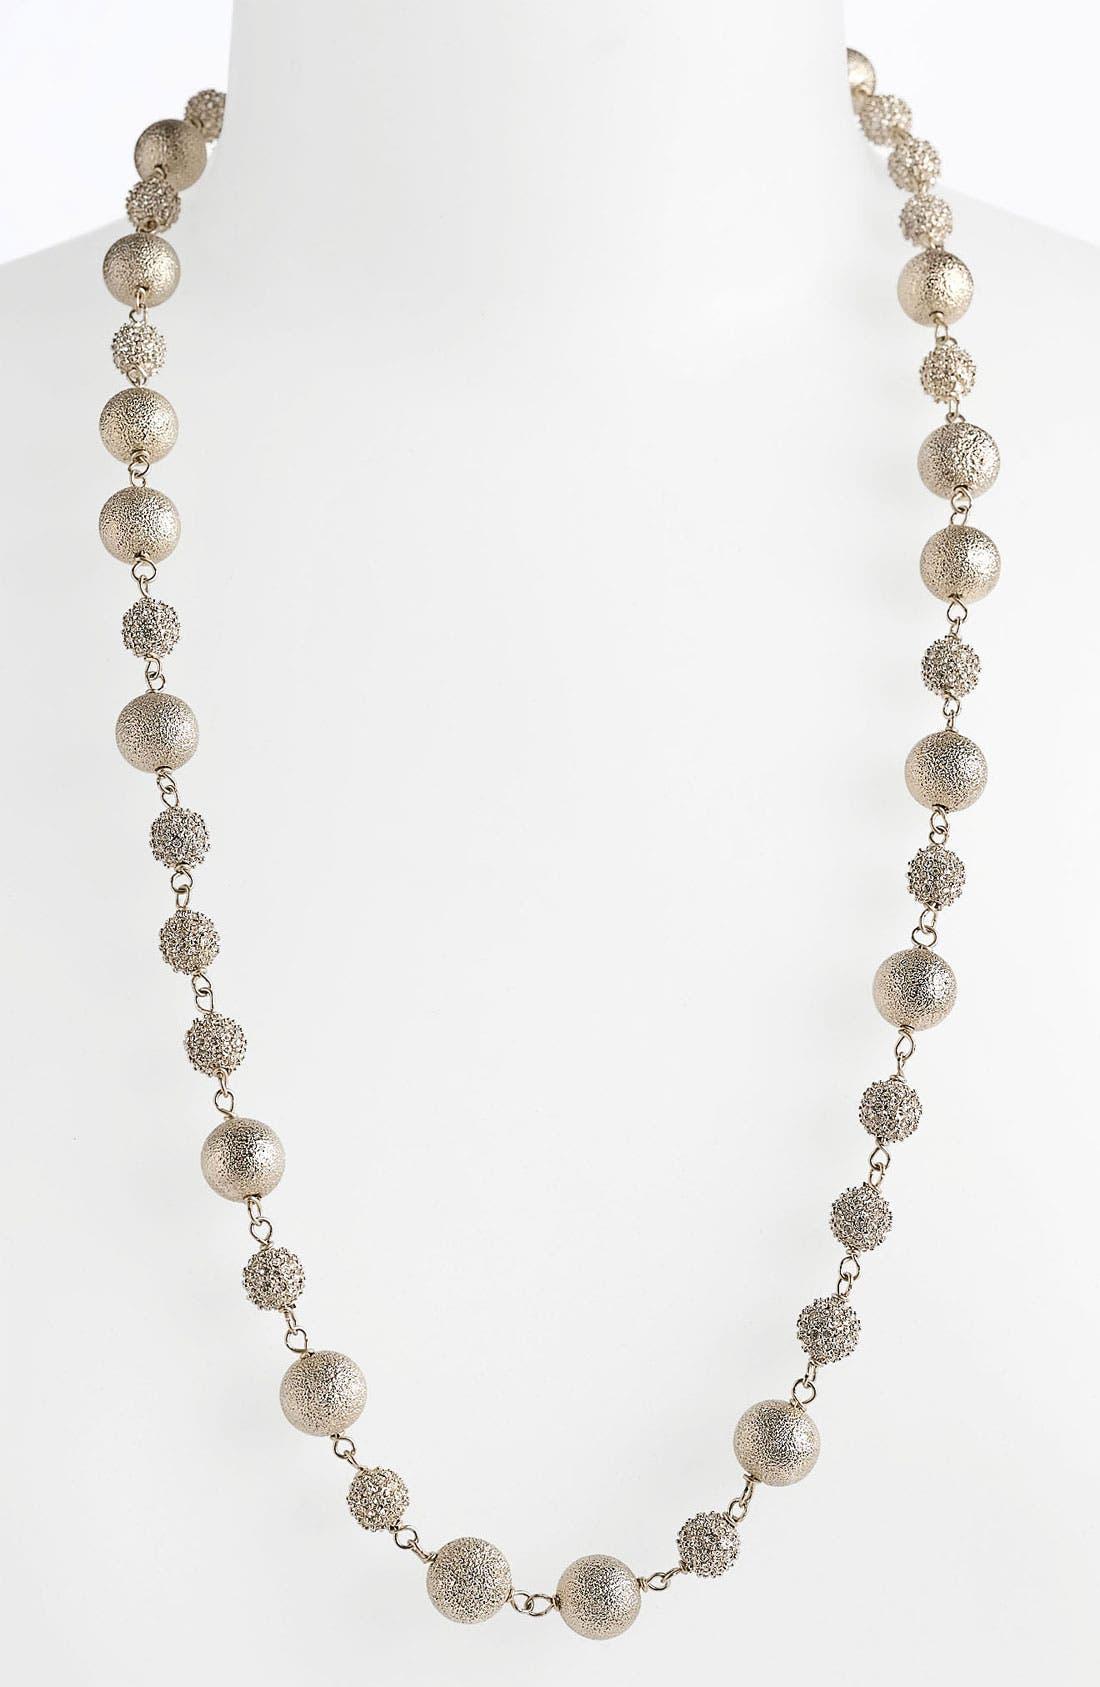 Main Image - St. John Collection Brushed Gold Short Necklace